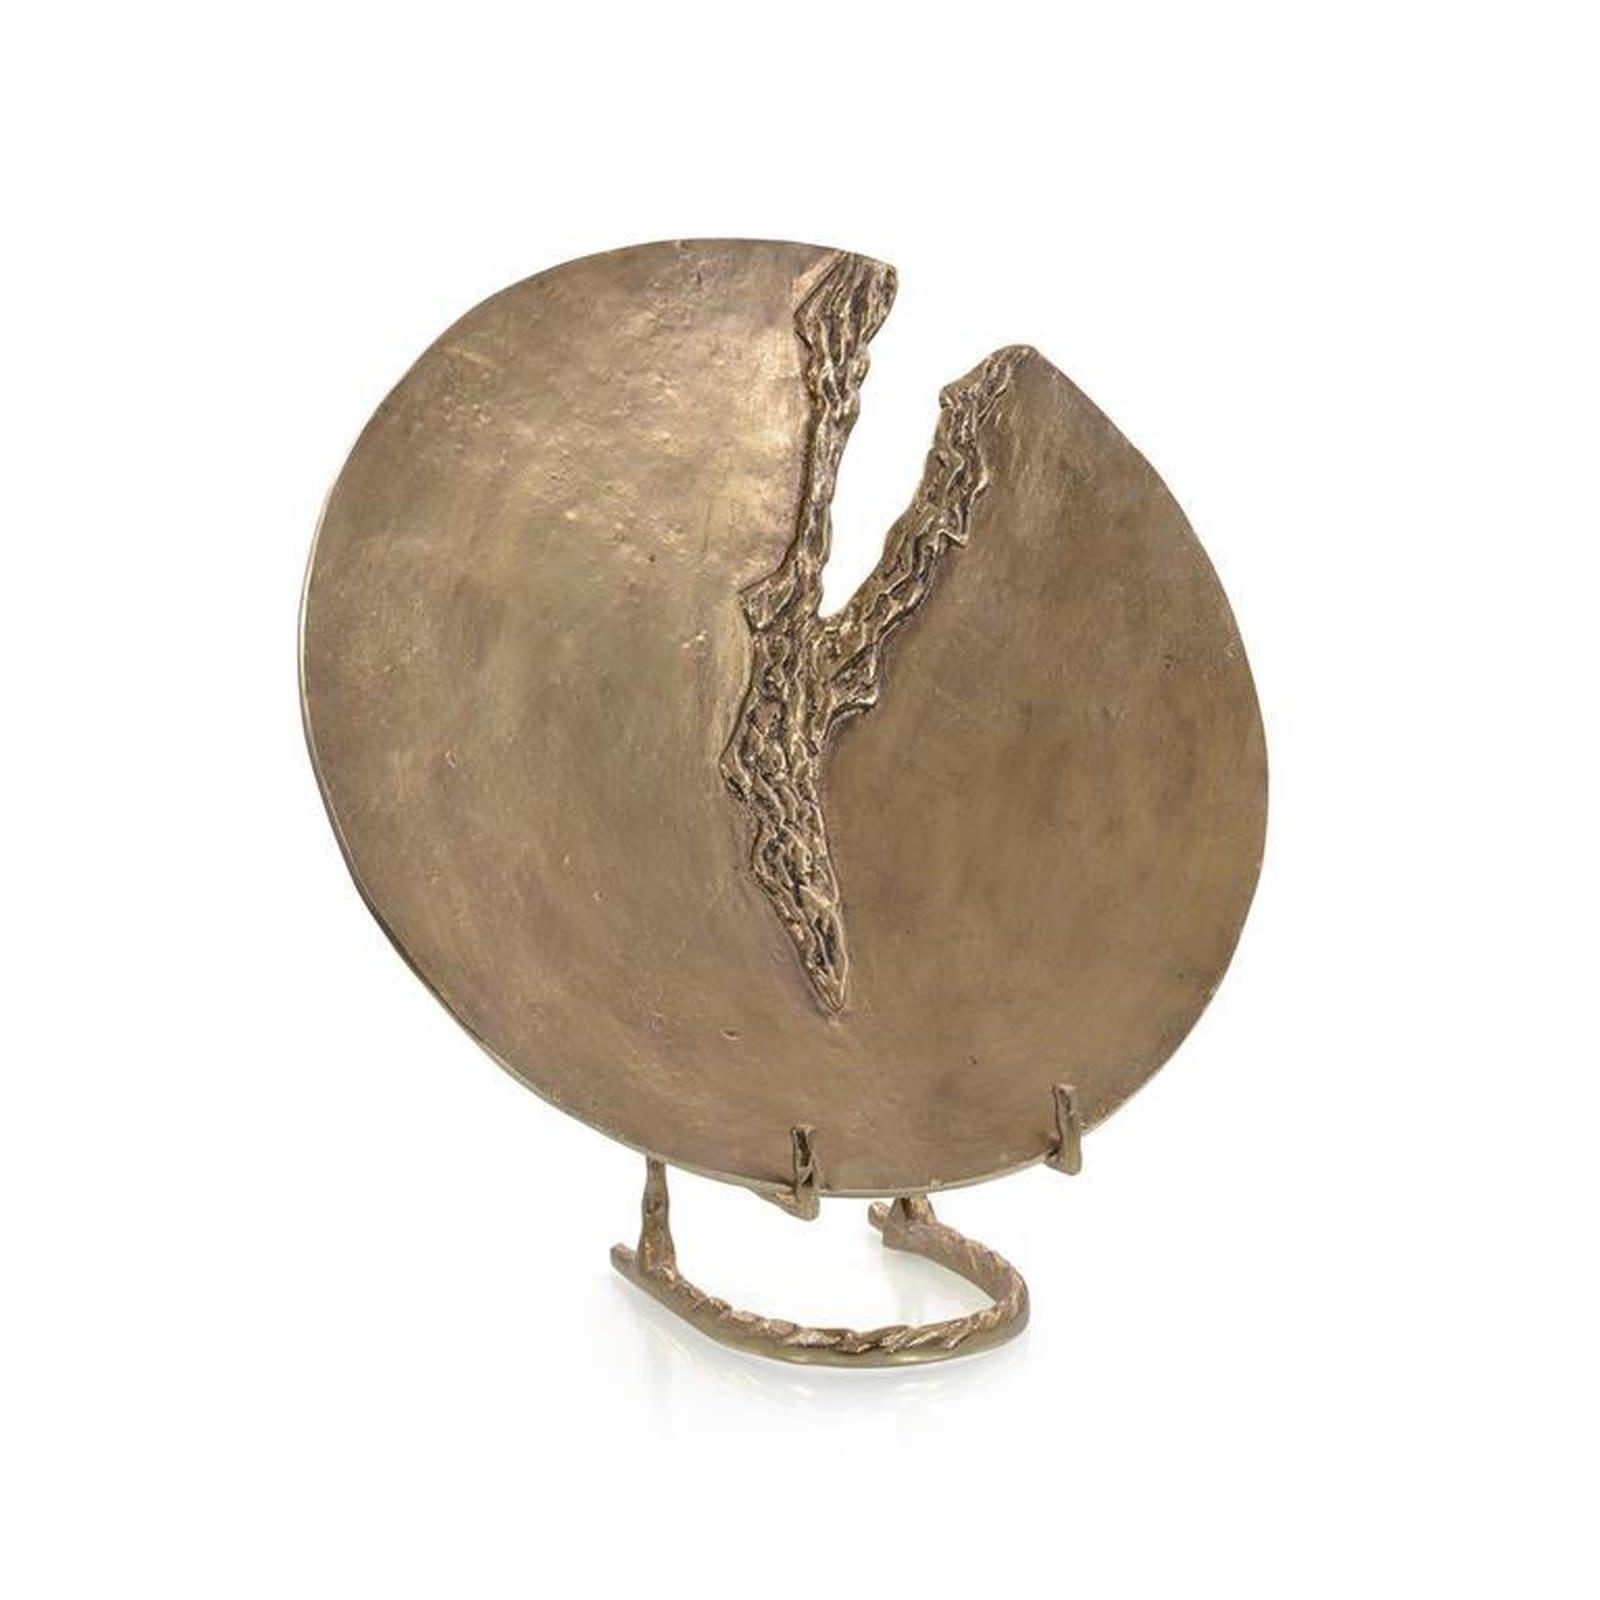 John Richard Hammered Brass Charger I